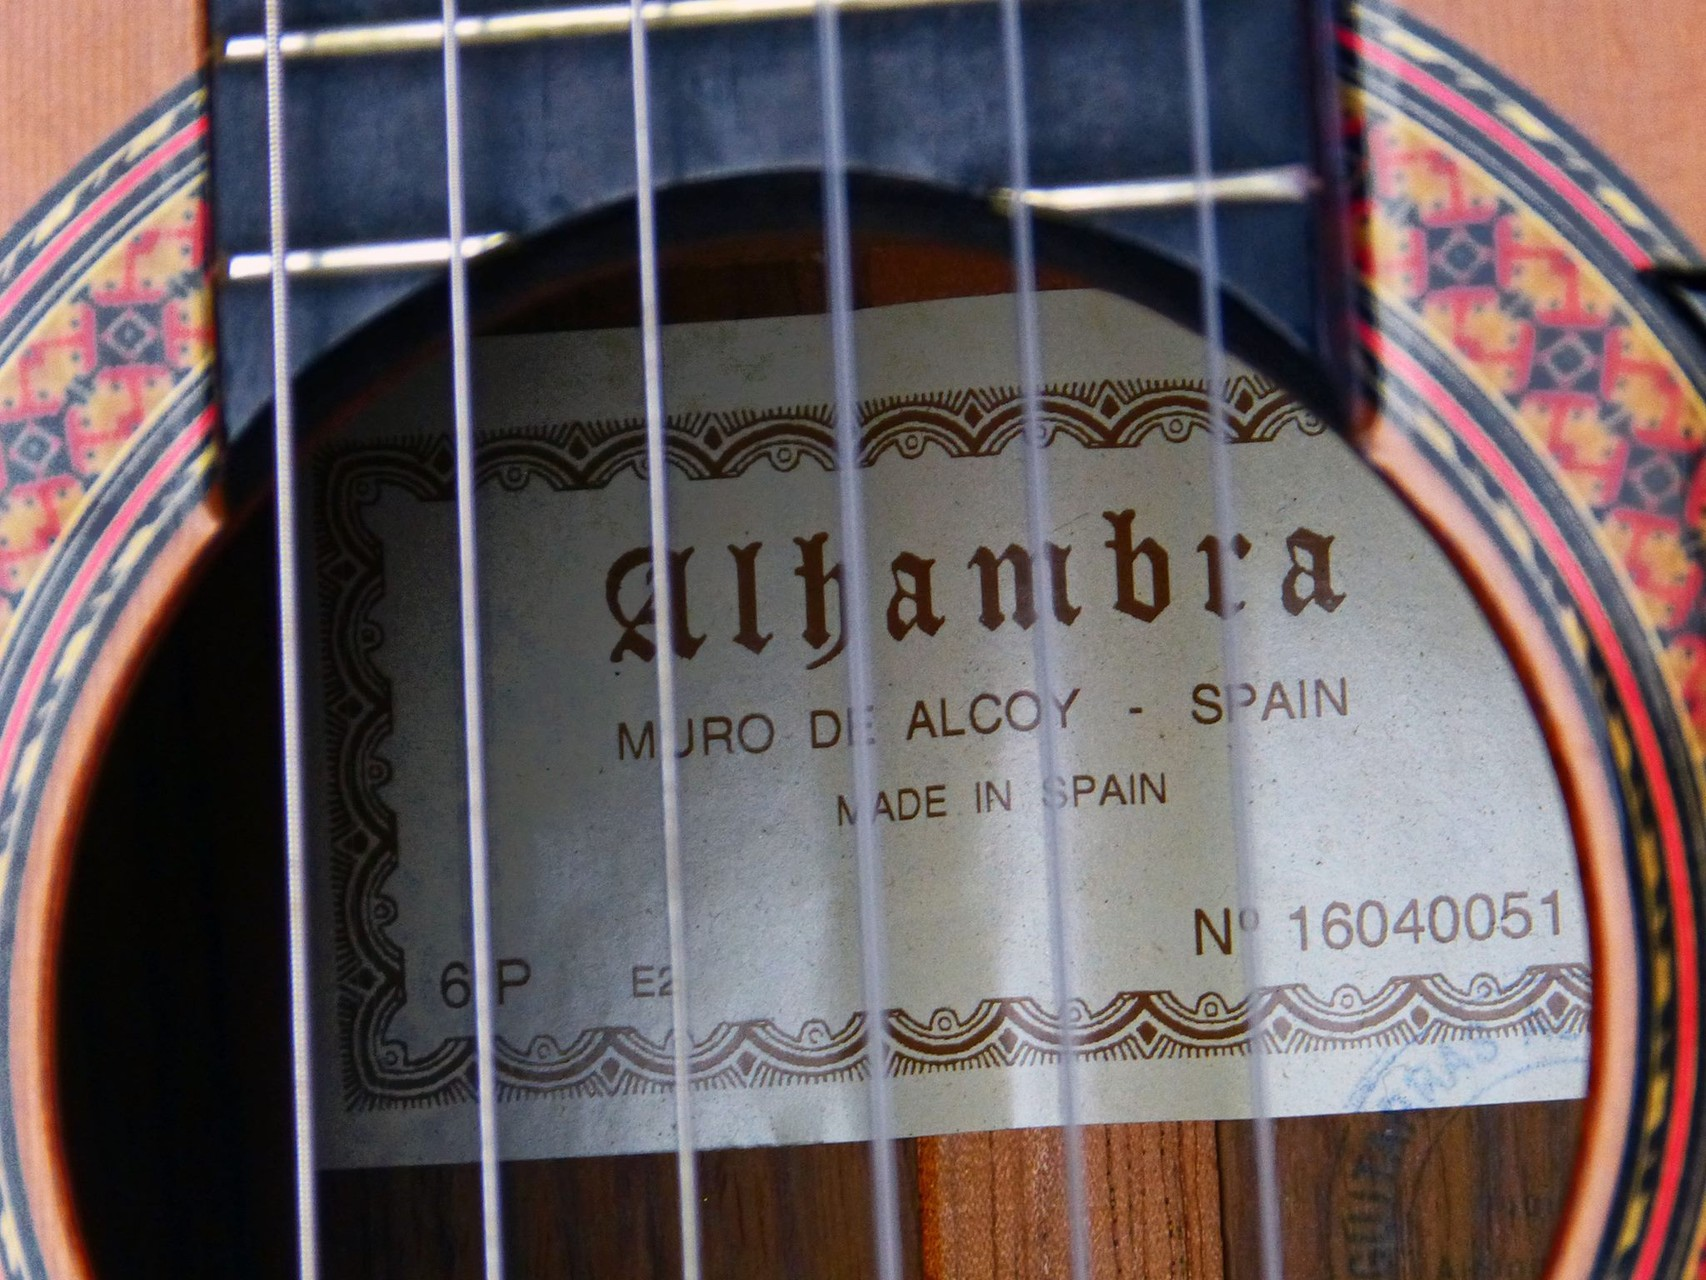 2001 Clásica Alhambra 6P